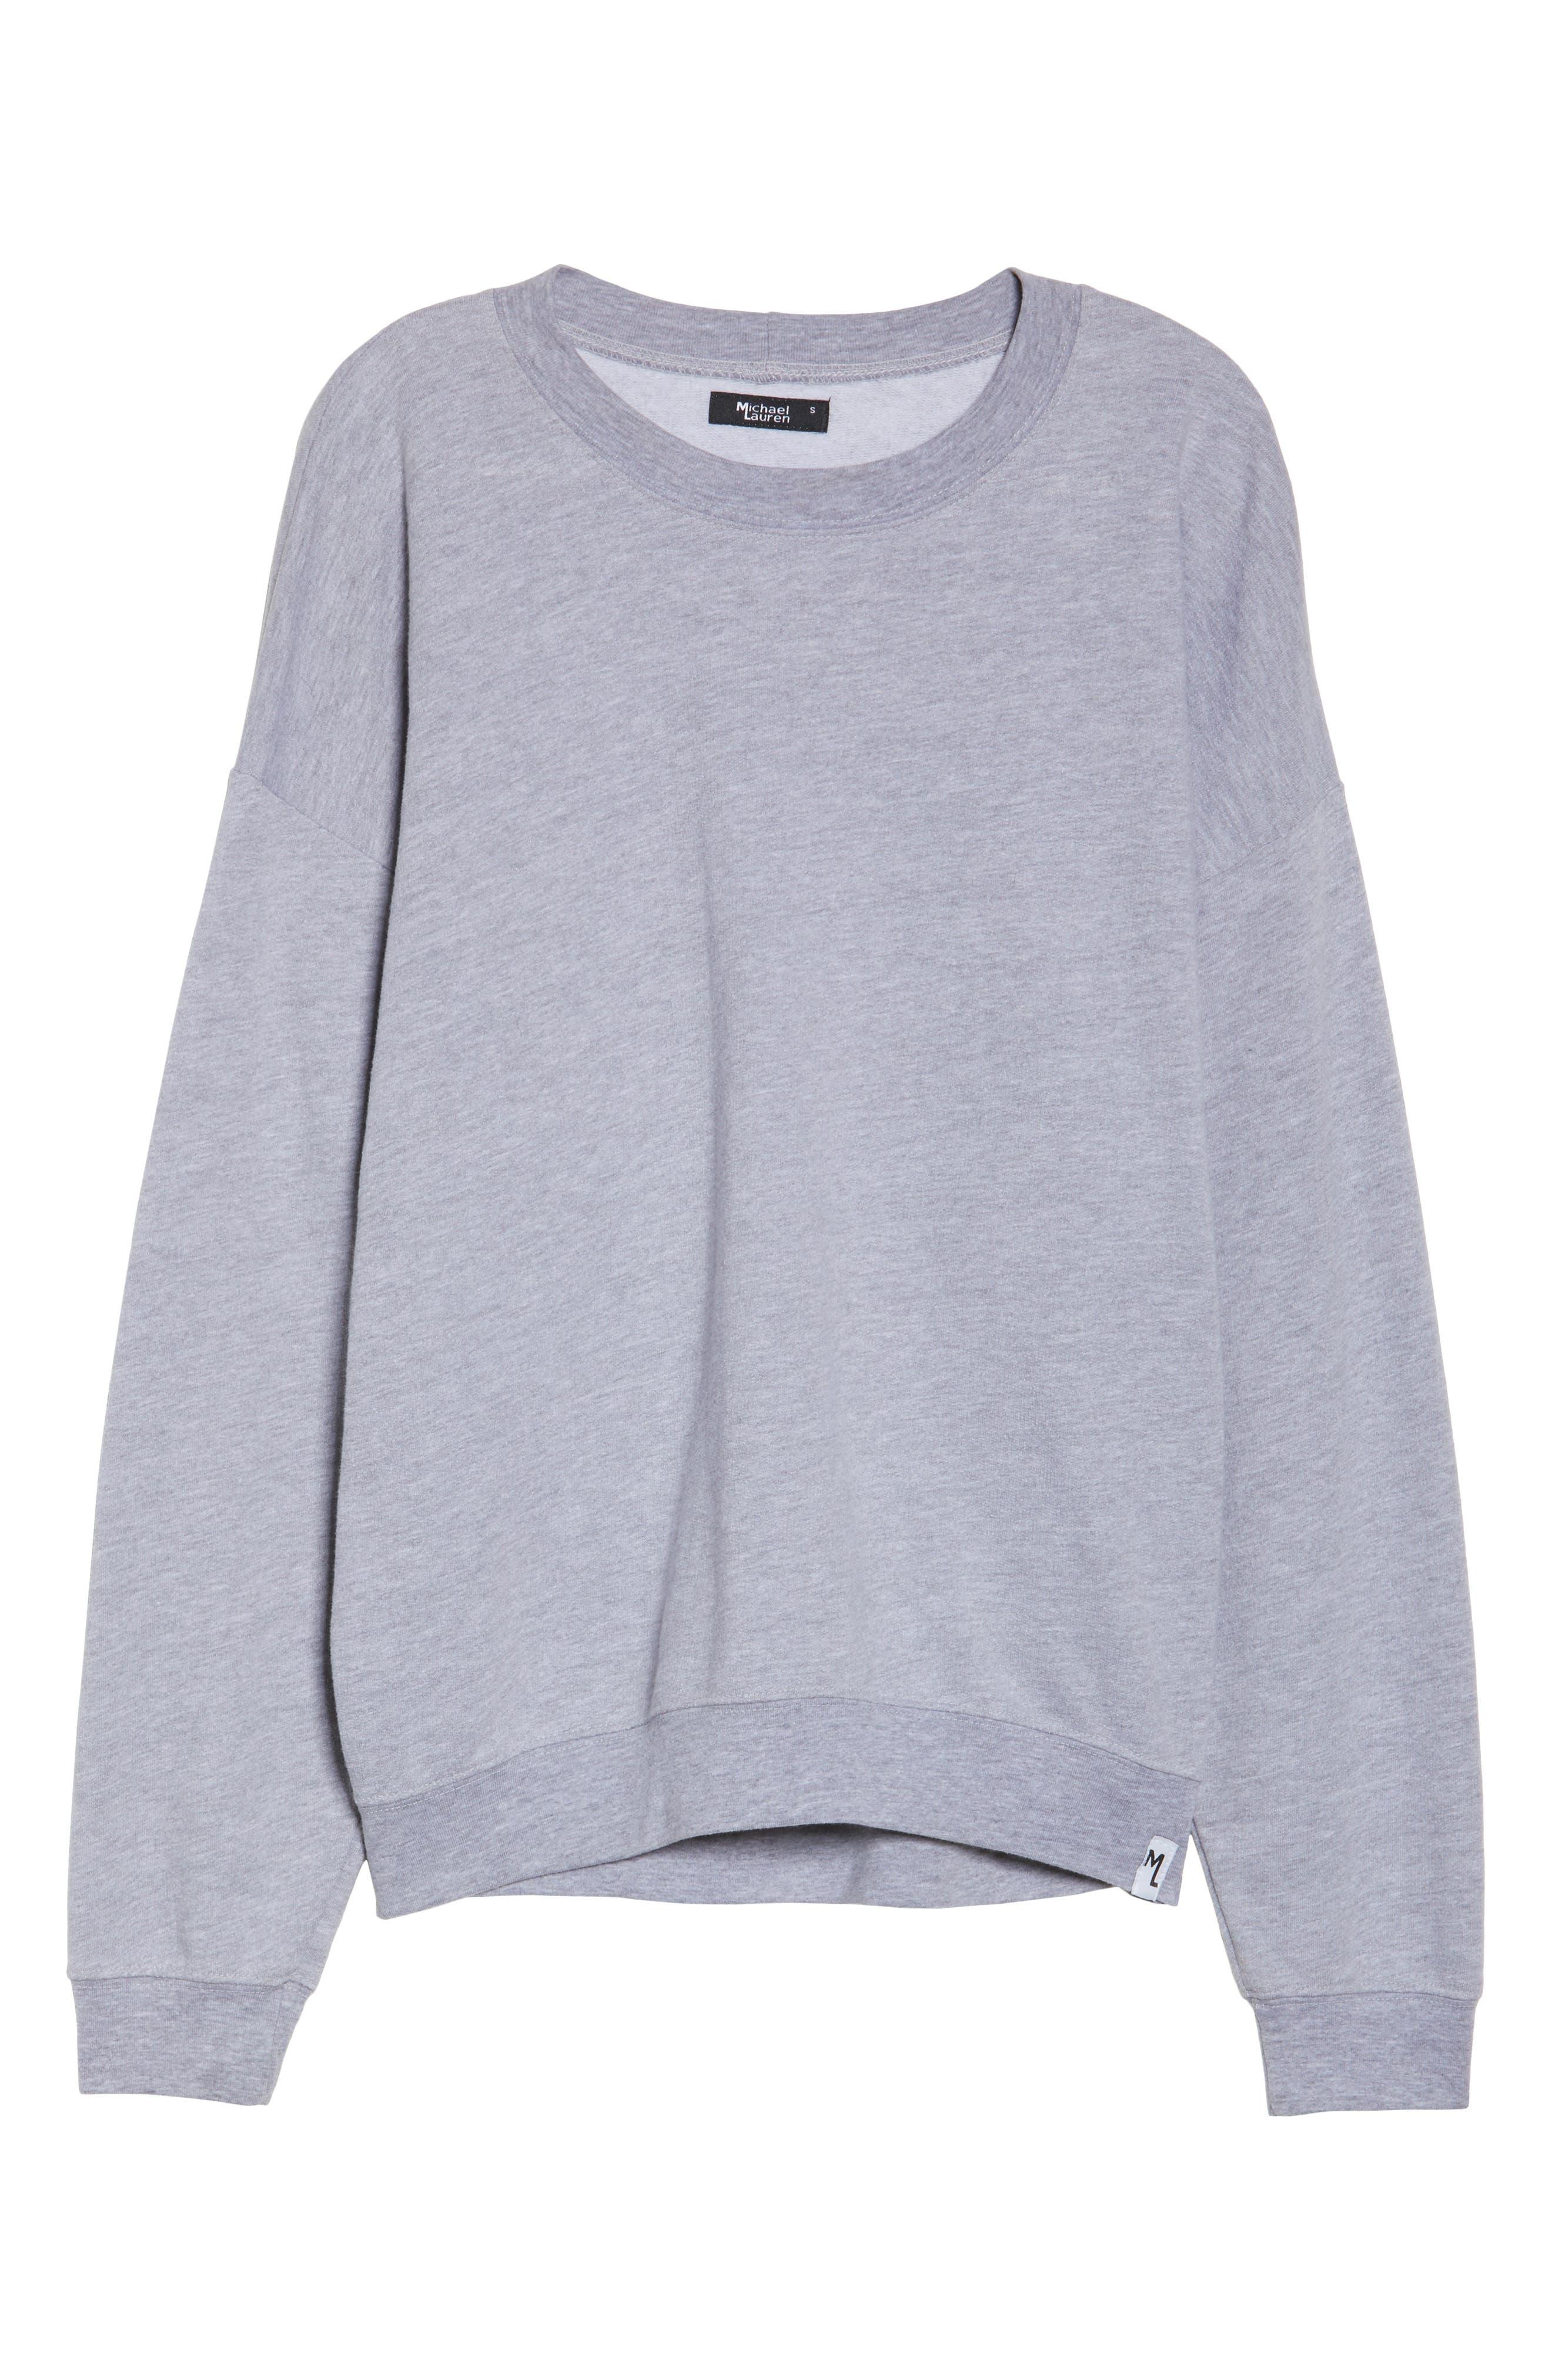 Ellstan Oversize Boyfriend Sweatshirt,                             Alternate thumbnail 6, color,                             035